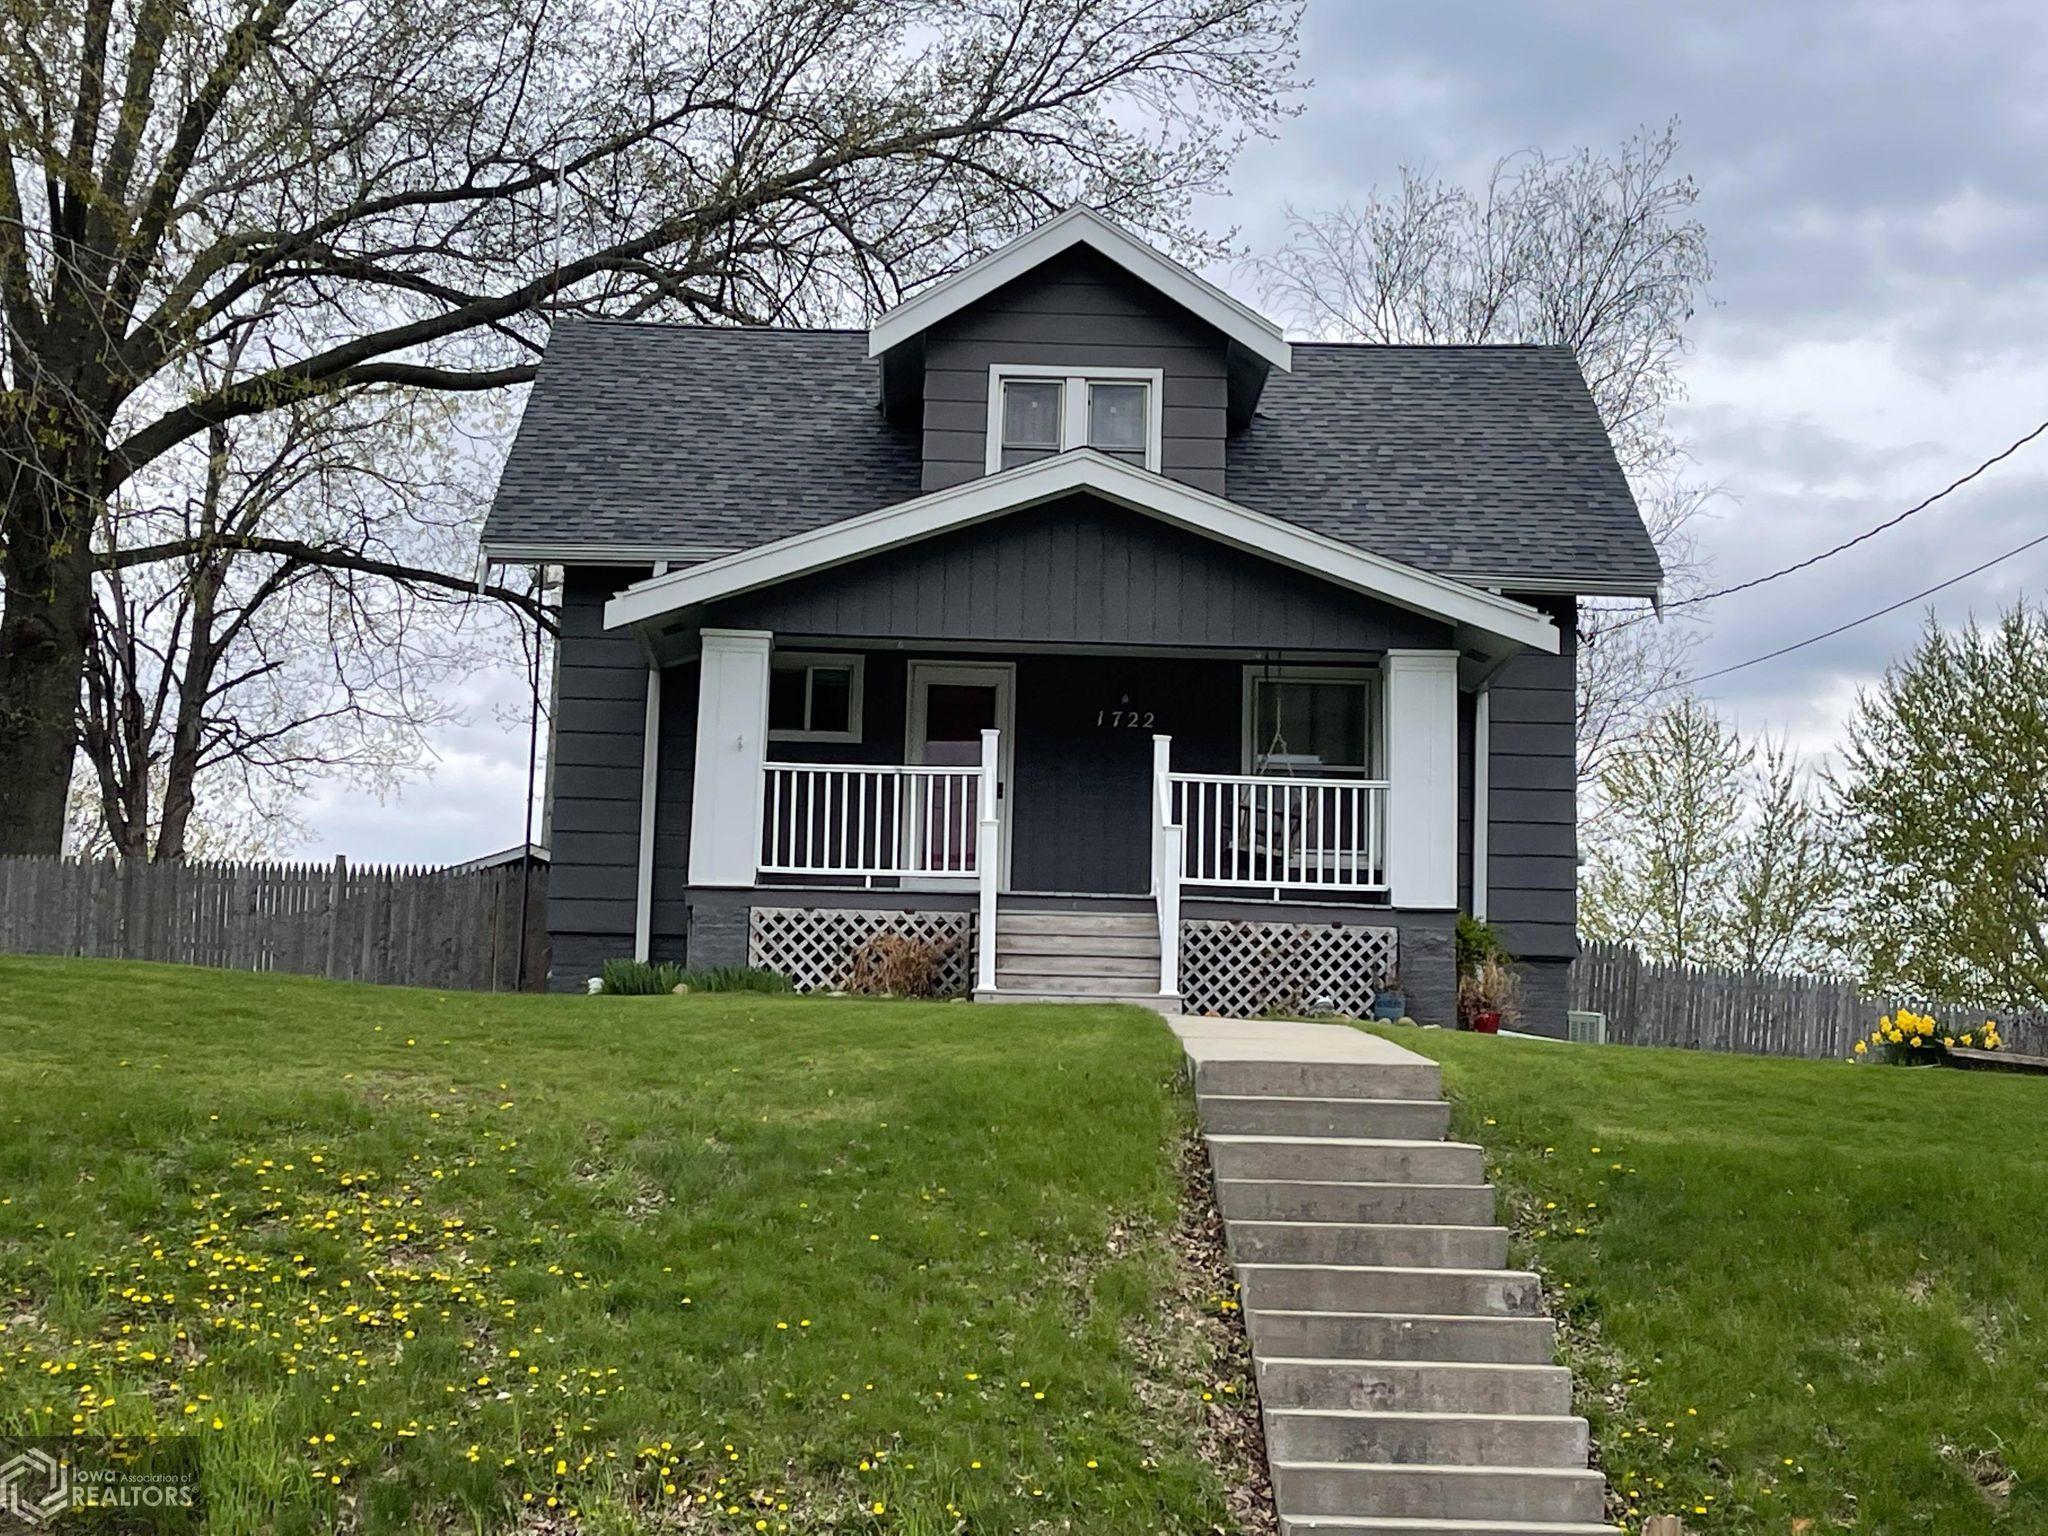 1722 Drake, Centerville, Iowa 52544-2927, 3 Bedrooms Bedrooms, ,2 BathroomsBathrooms,Single Family,For Sale,Drake,5742051